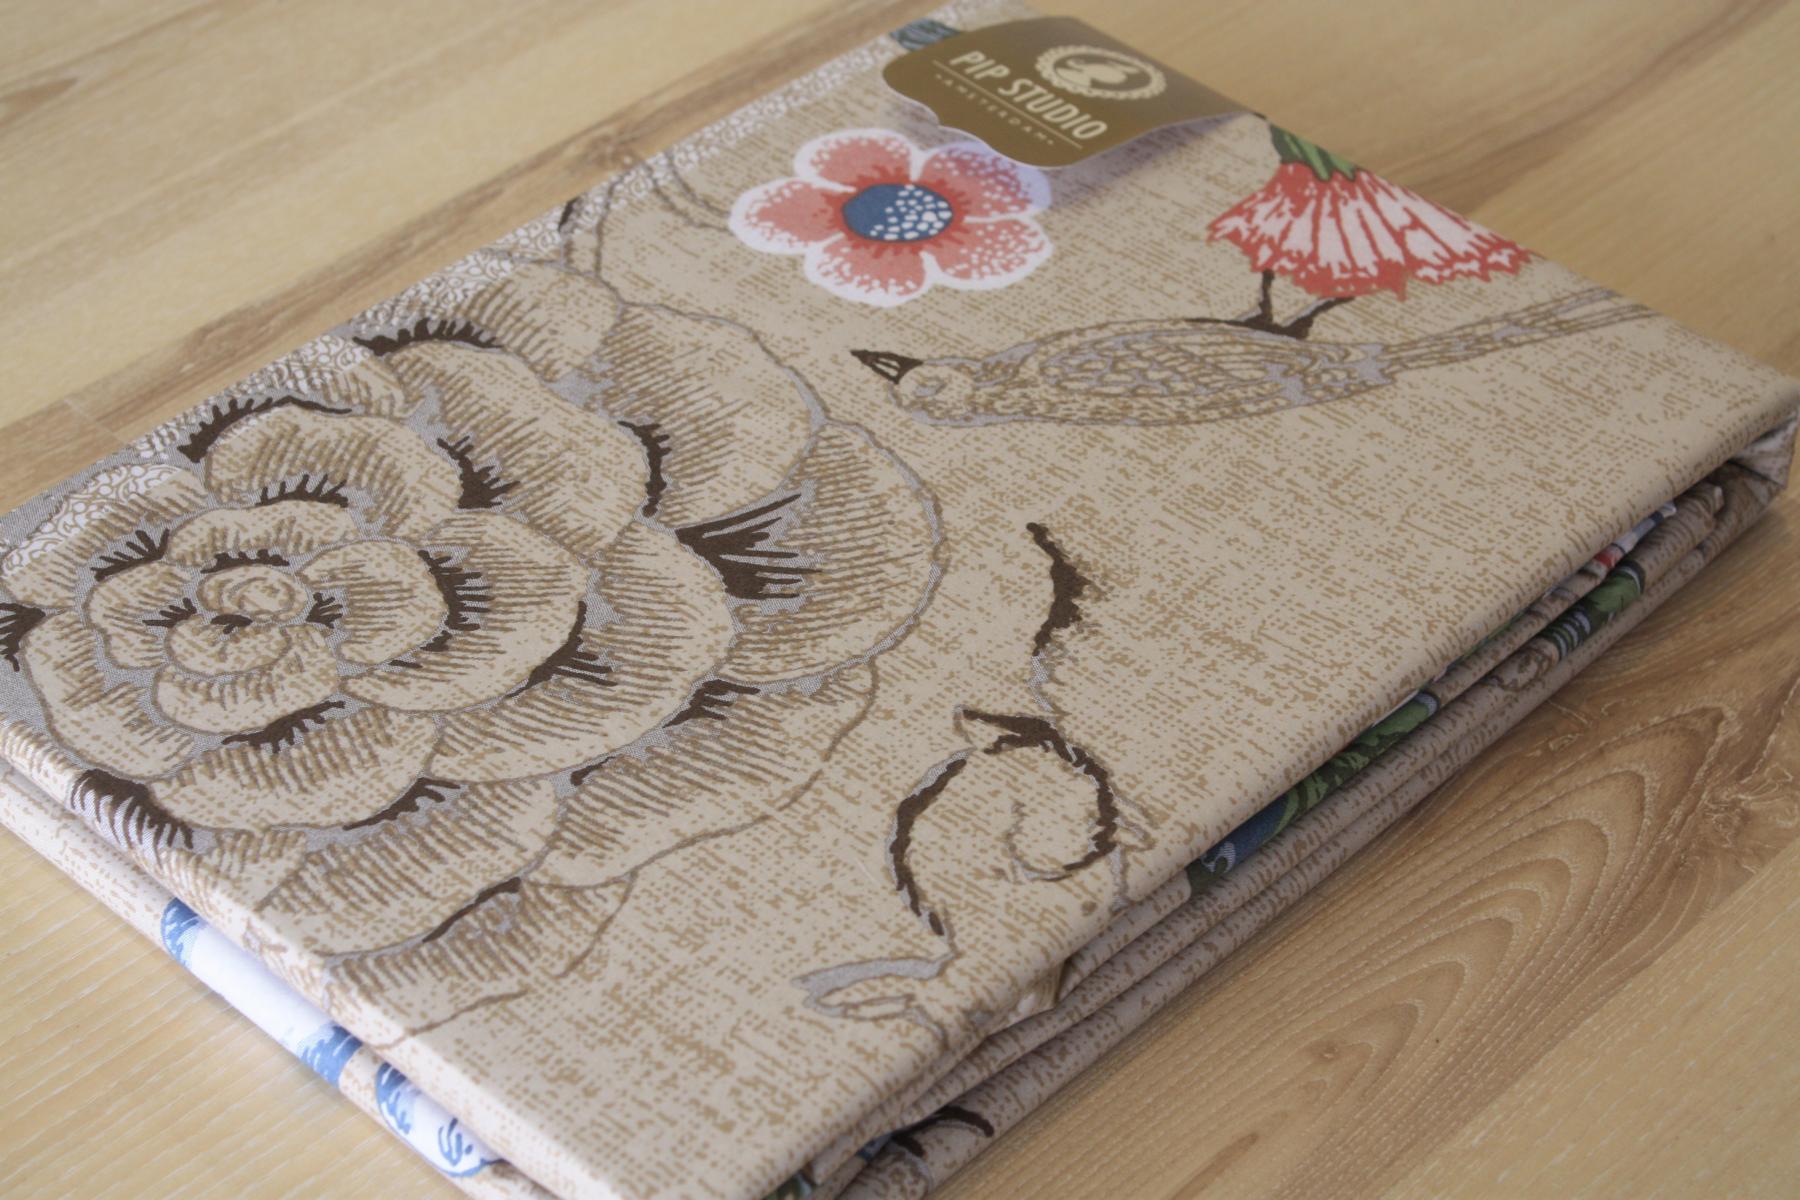 pip studio bed cover spring to life khaki 2 teilig. Black Bedroom Furniture Sets. Home Design Ideas